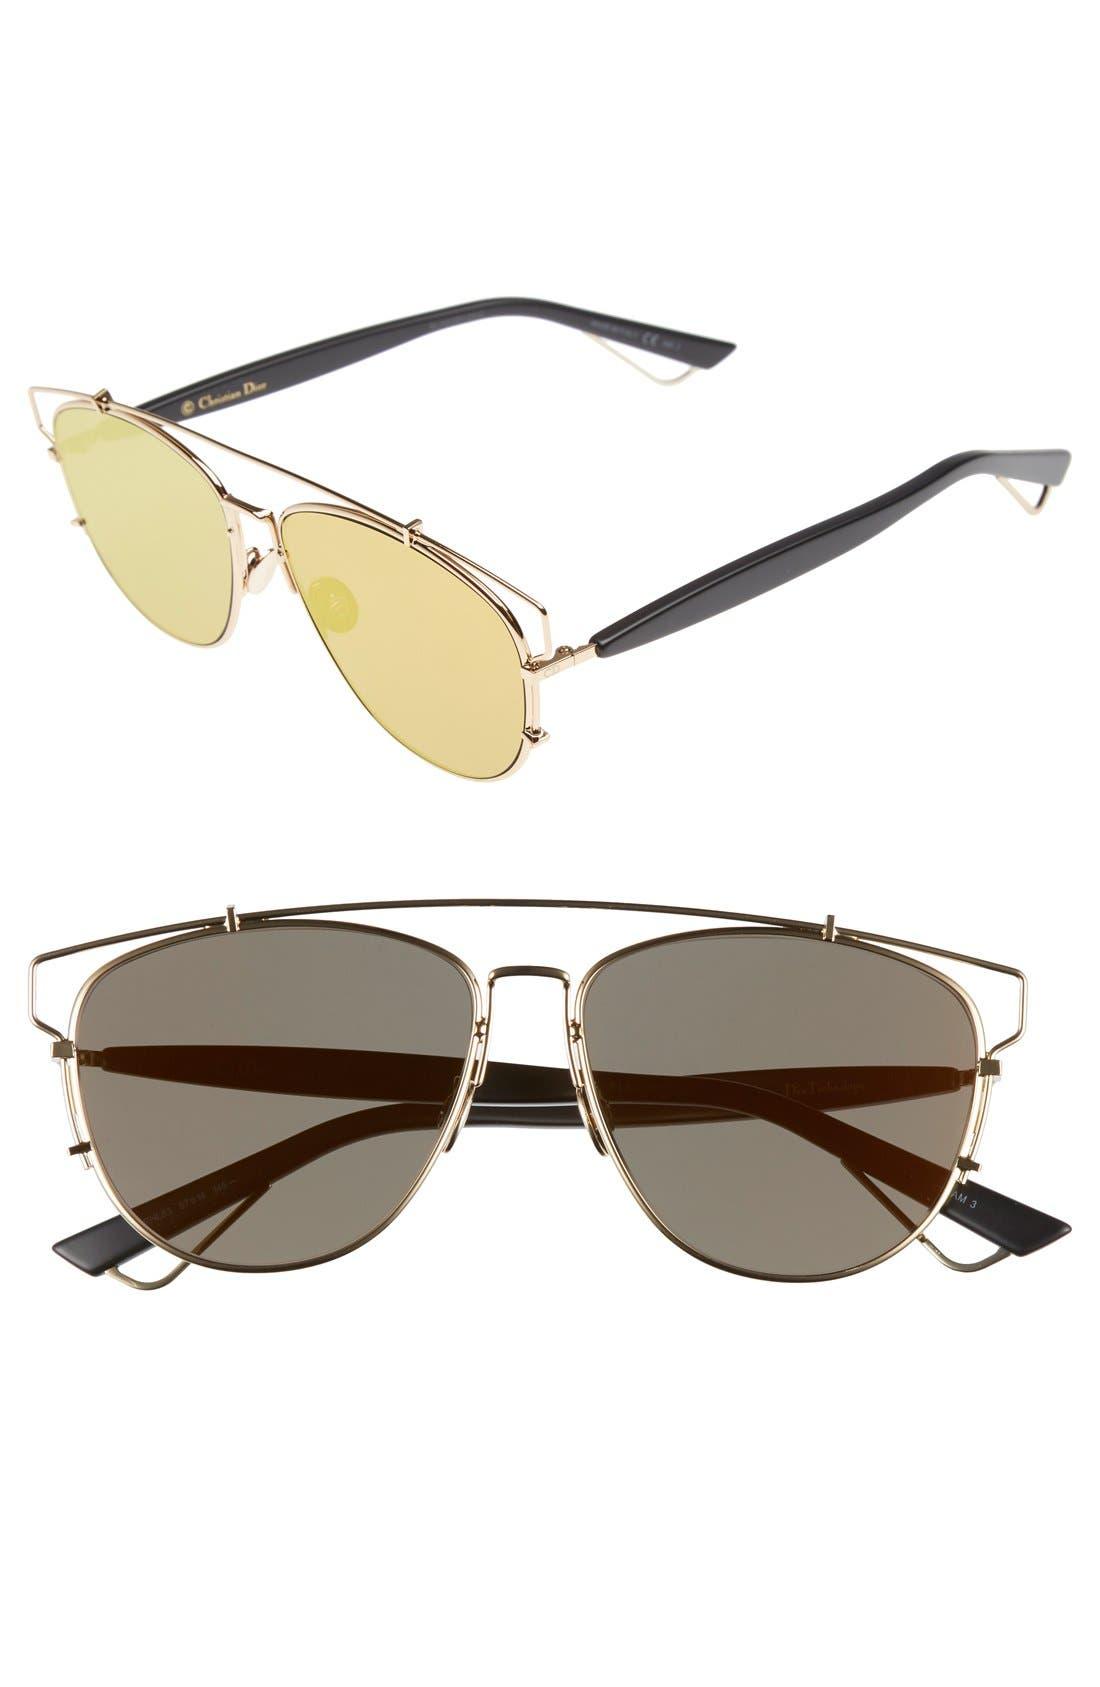 Technologic 57mm Brow Bar Sunglasses,                             Main thumbnail 3, color,